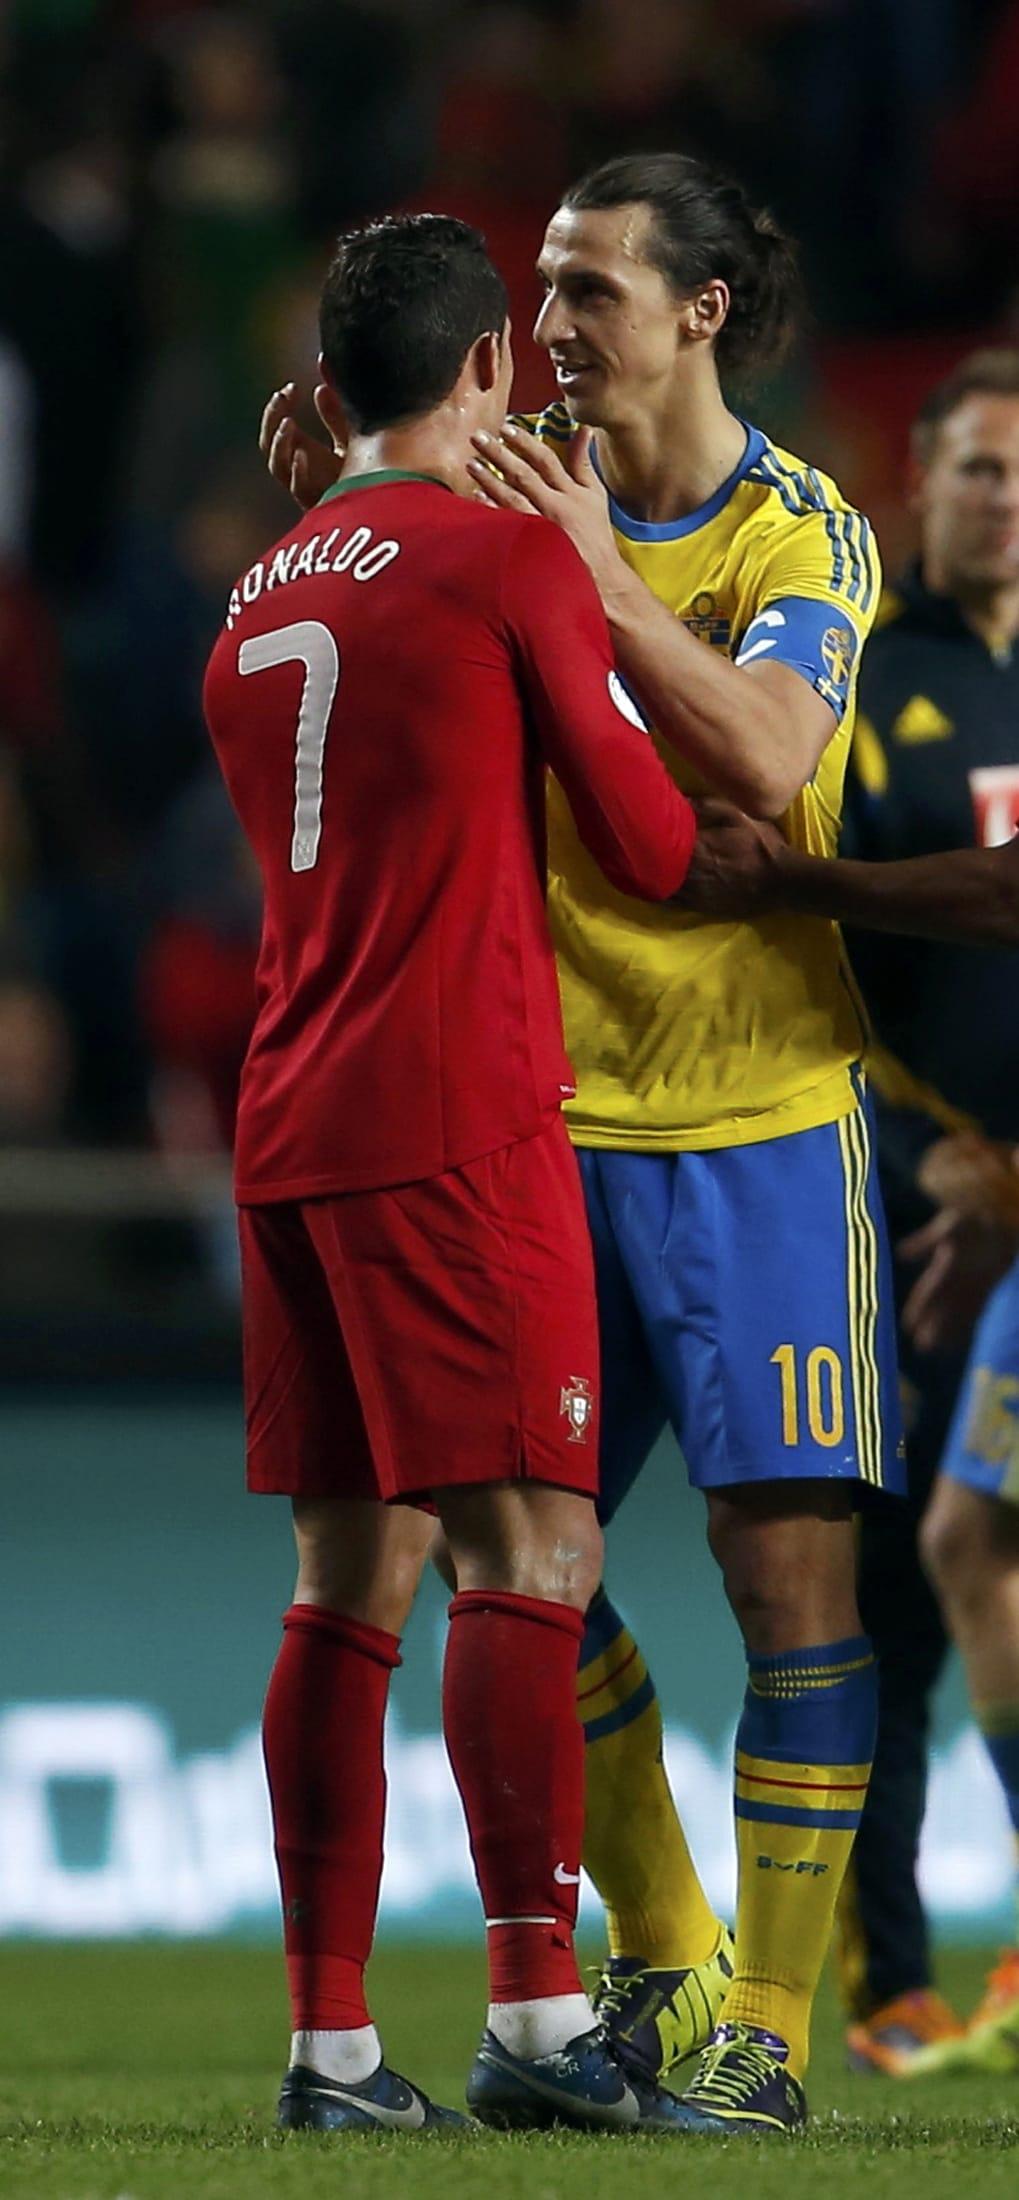 Zlatan Ibrahimovic Sweden national team player with Cristiano Ronaldo Portugal national team player